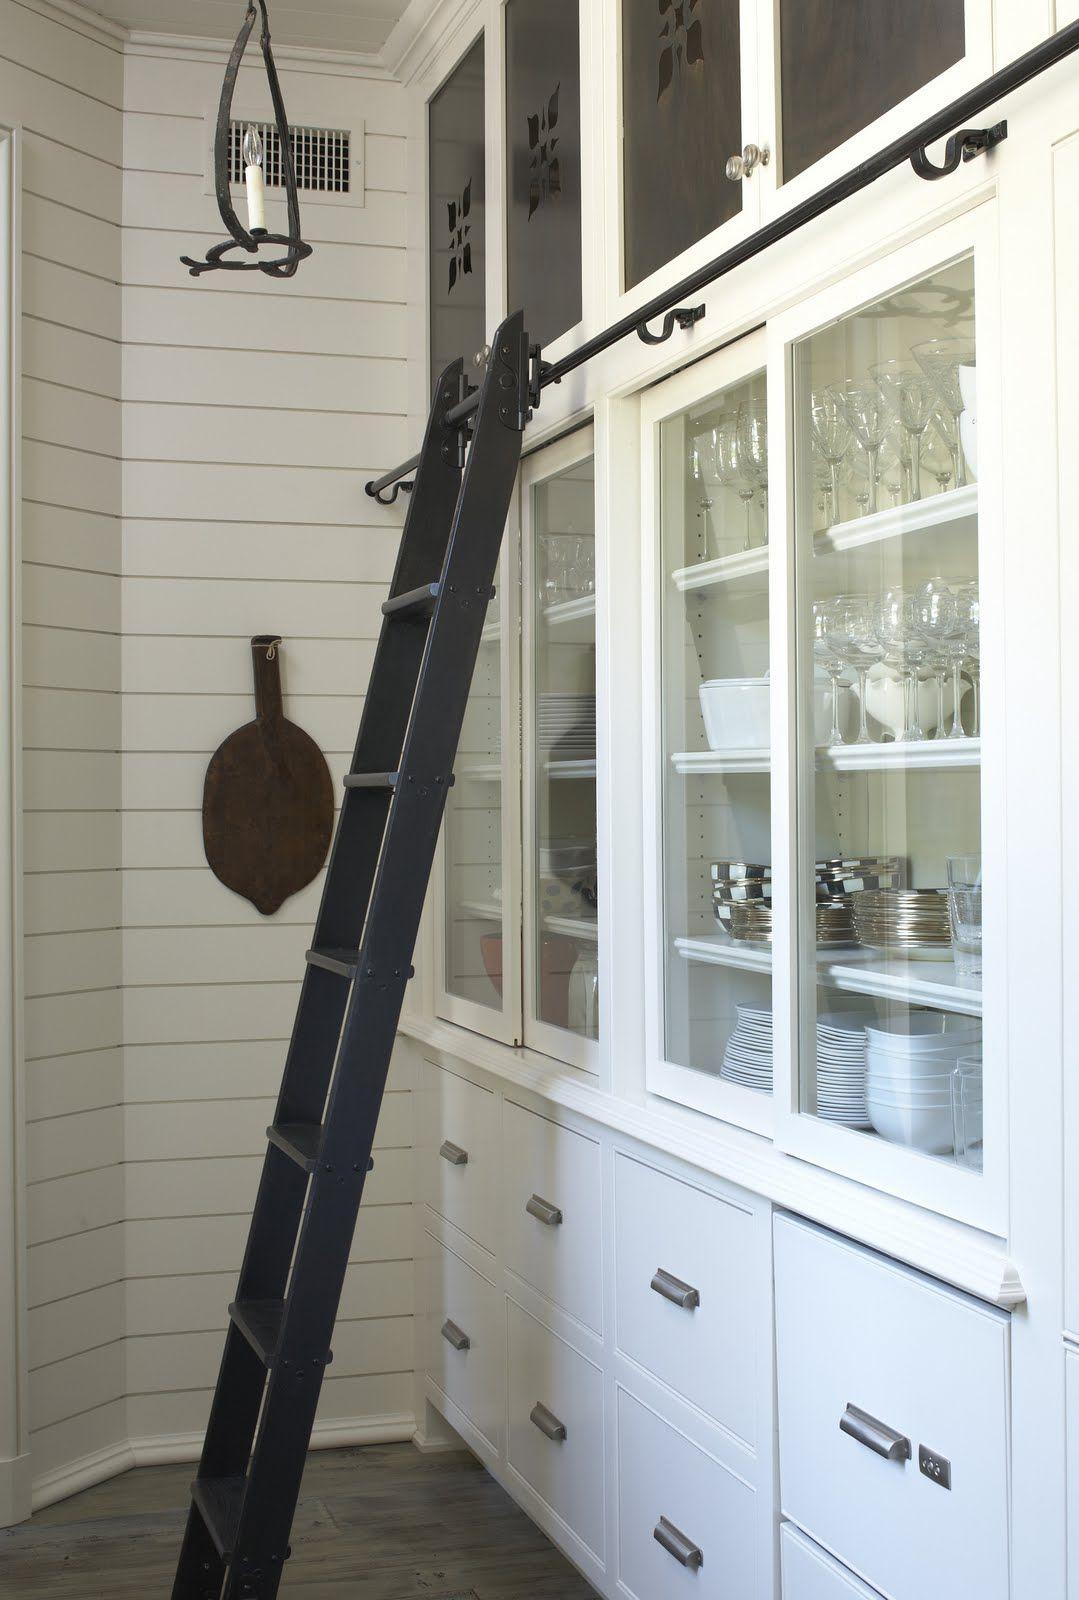 Culinary climbing modern farmhouse kitchens modern farmhouse and